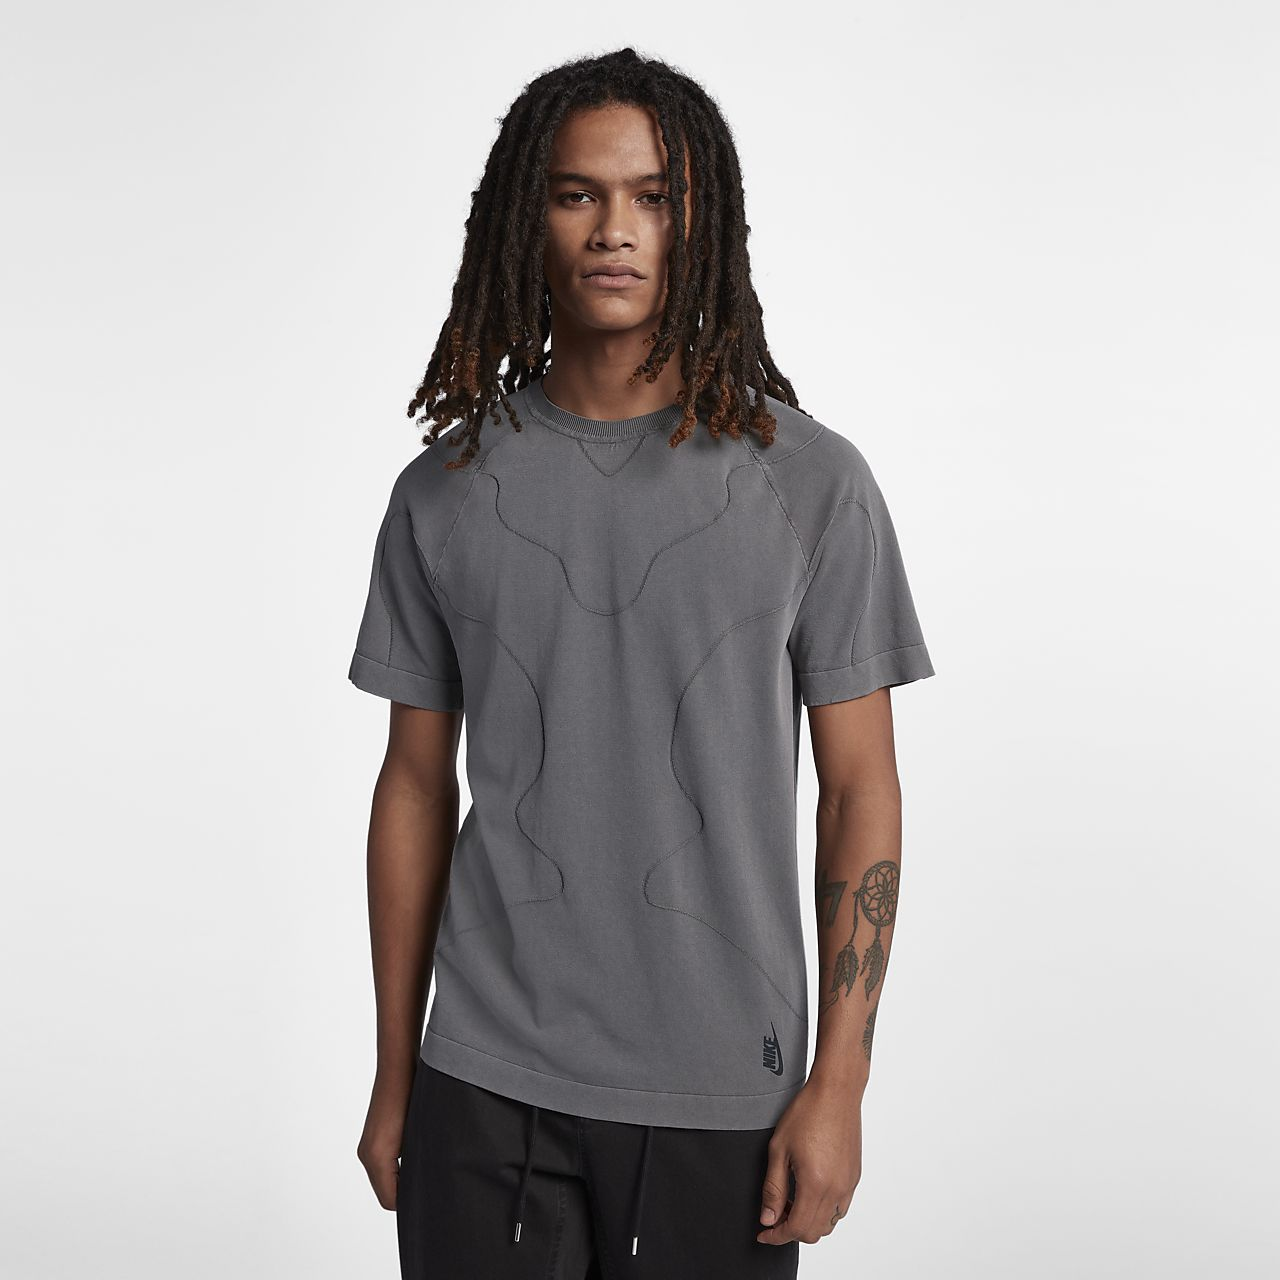 Camisola de manga curta NikeLab Made in Italy para homem